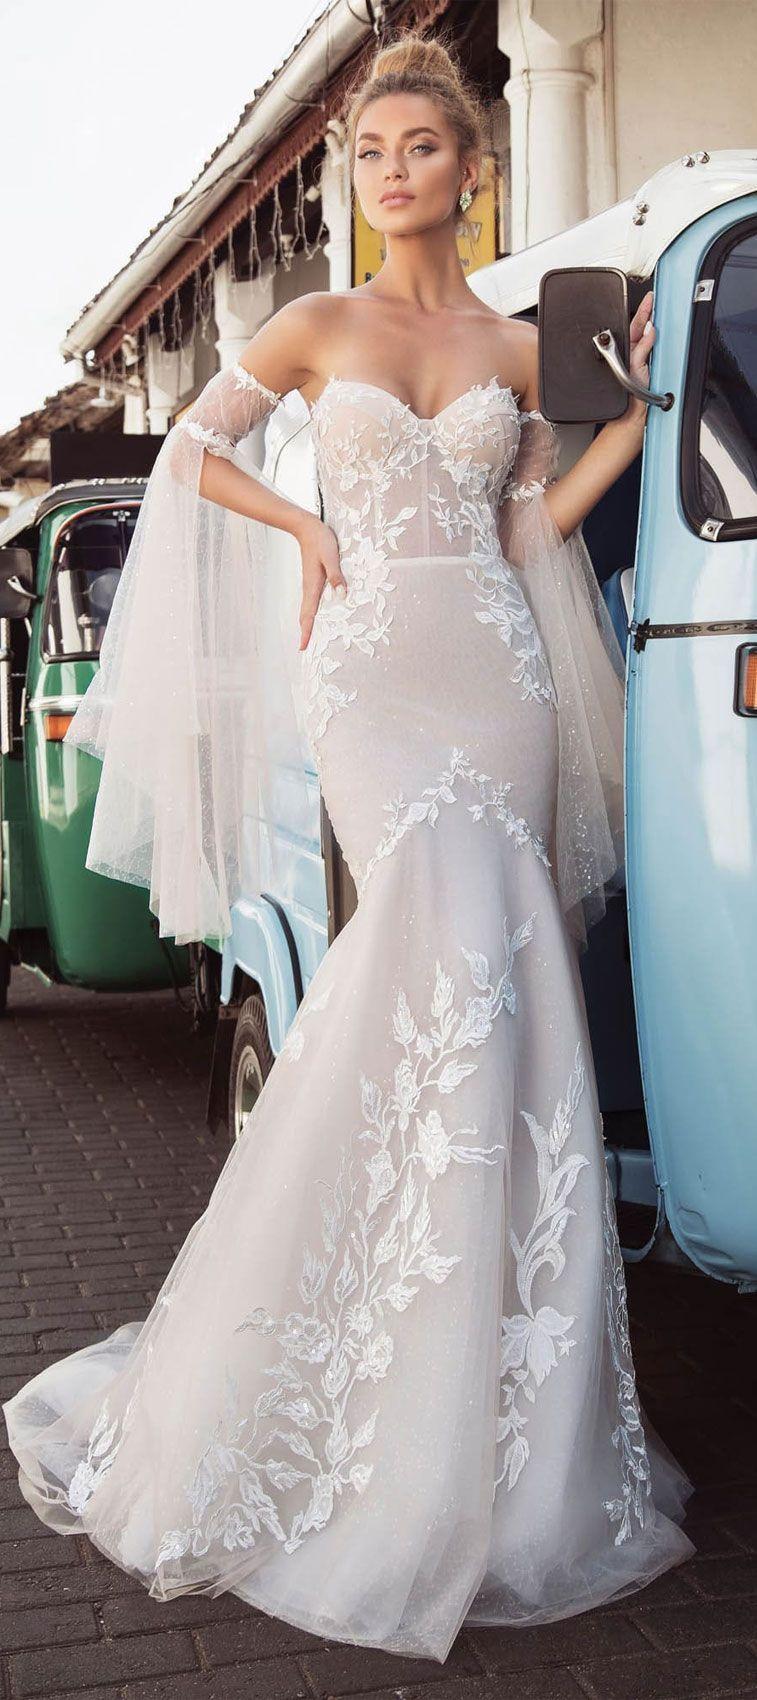 Wedding dress shops in deira dubai  Lanesta Wedding Dresses u Treasure of the seas bridal collection